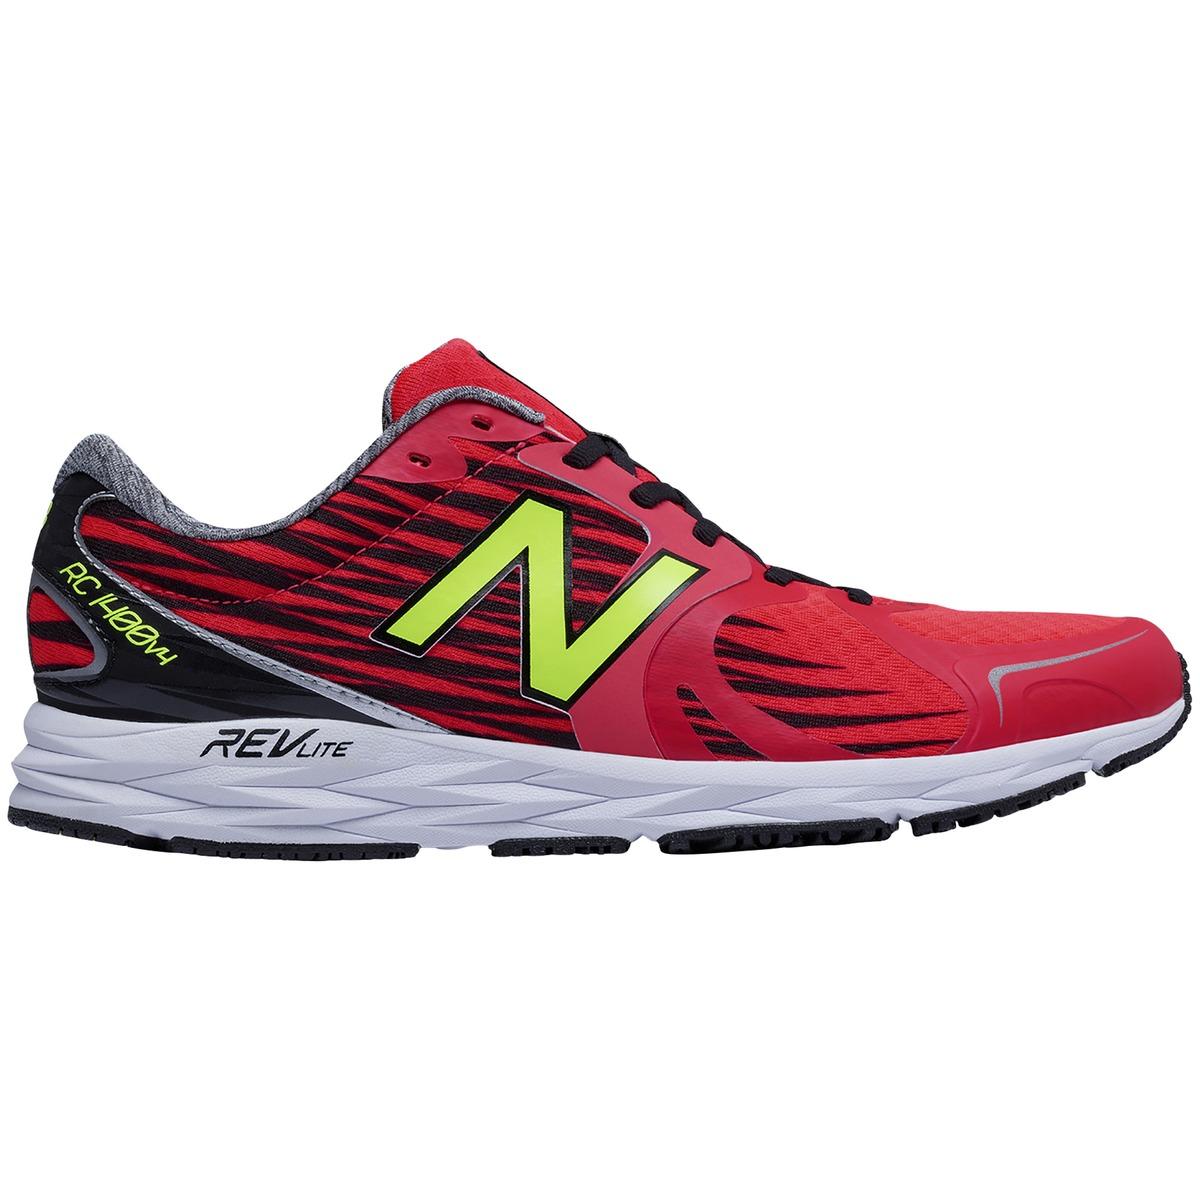 new balance italienske sko, New Balance 880V6 Neutrale